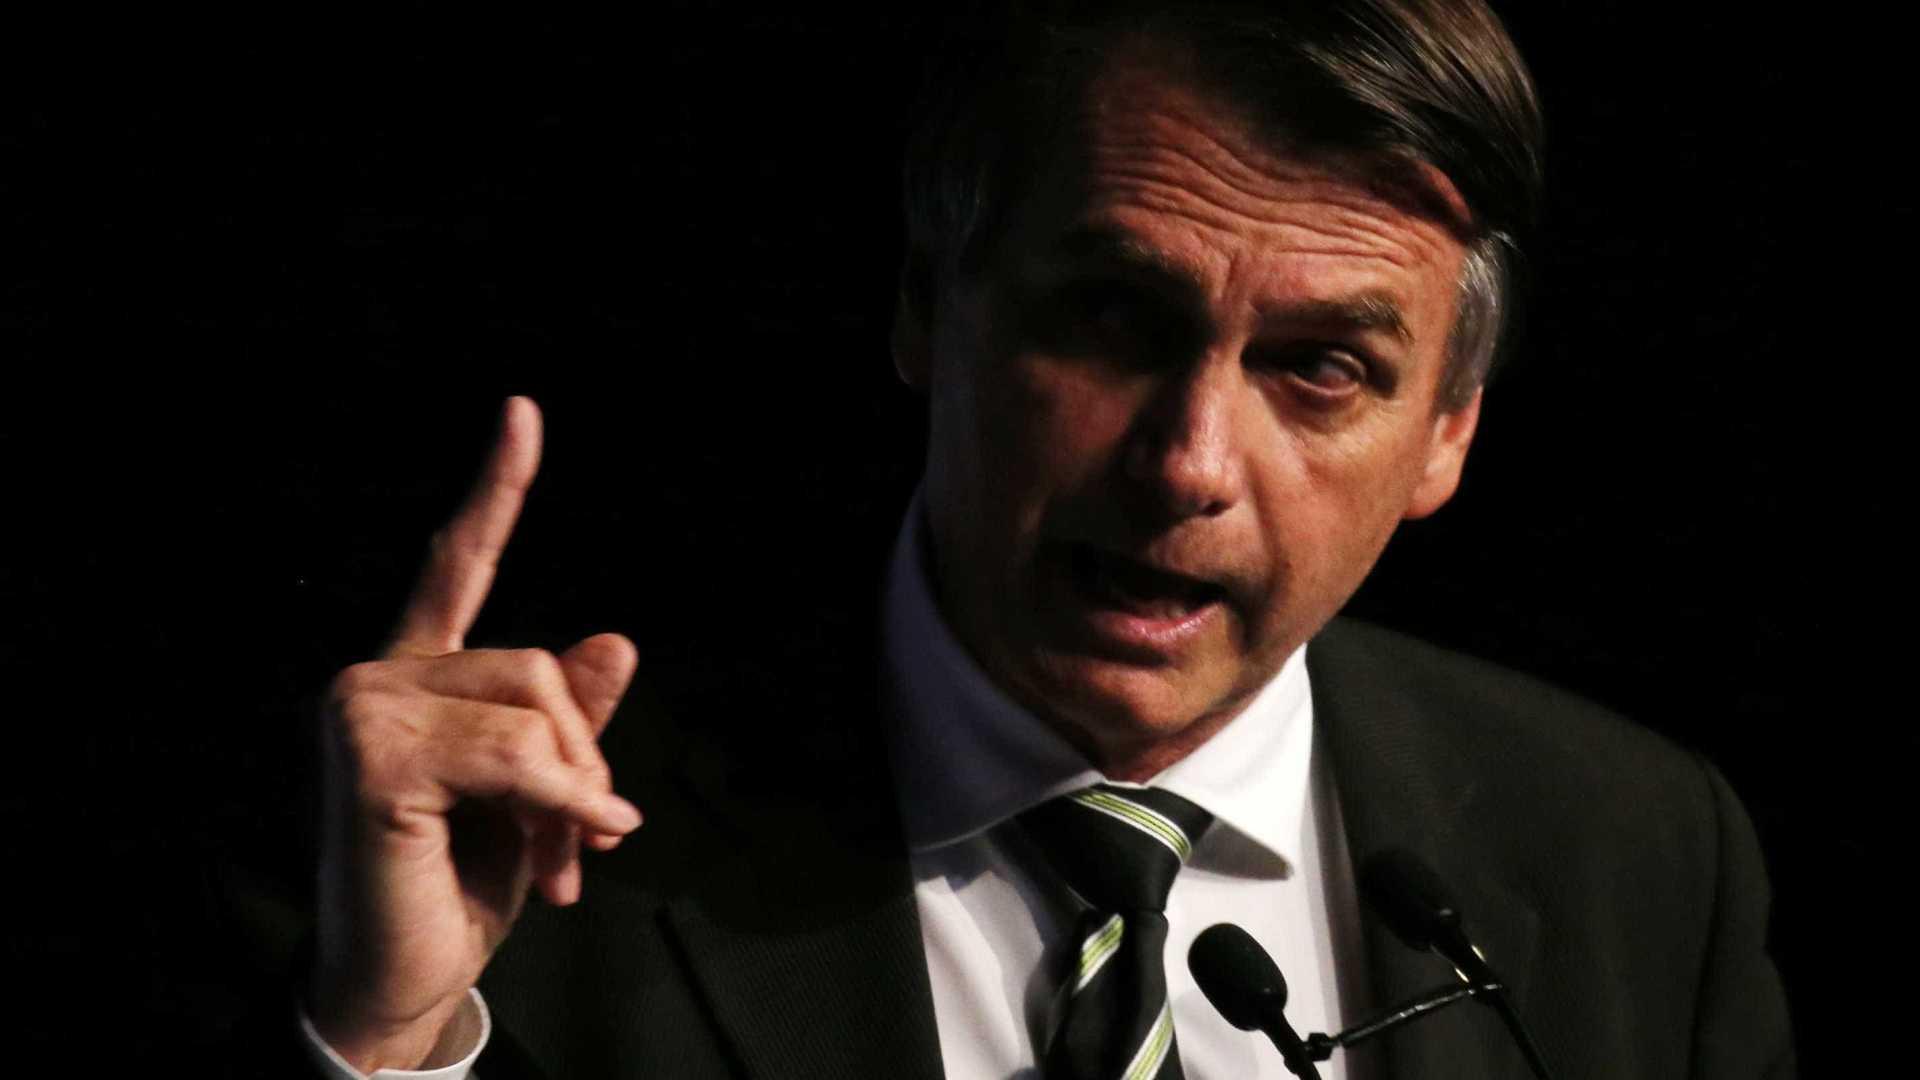 Em entrevista, Bolsonaro critica PT e chama Haddad de 'fantoche'